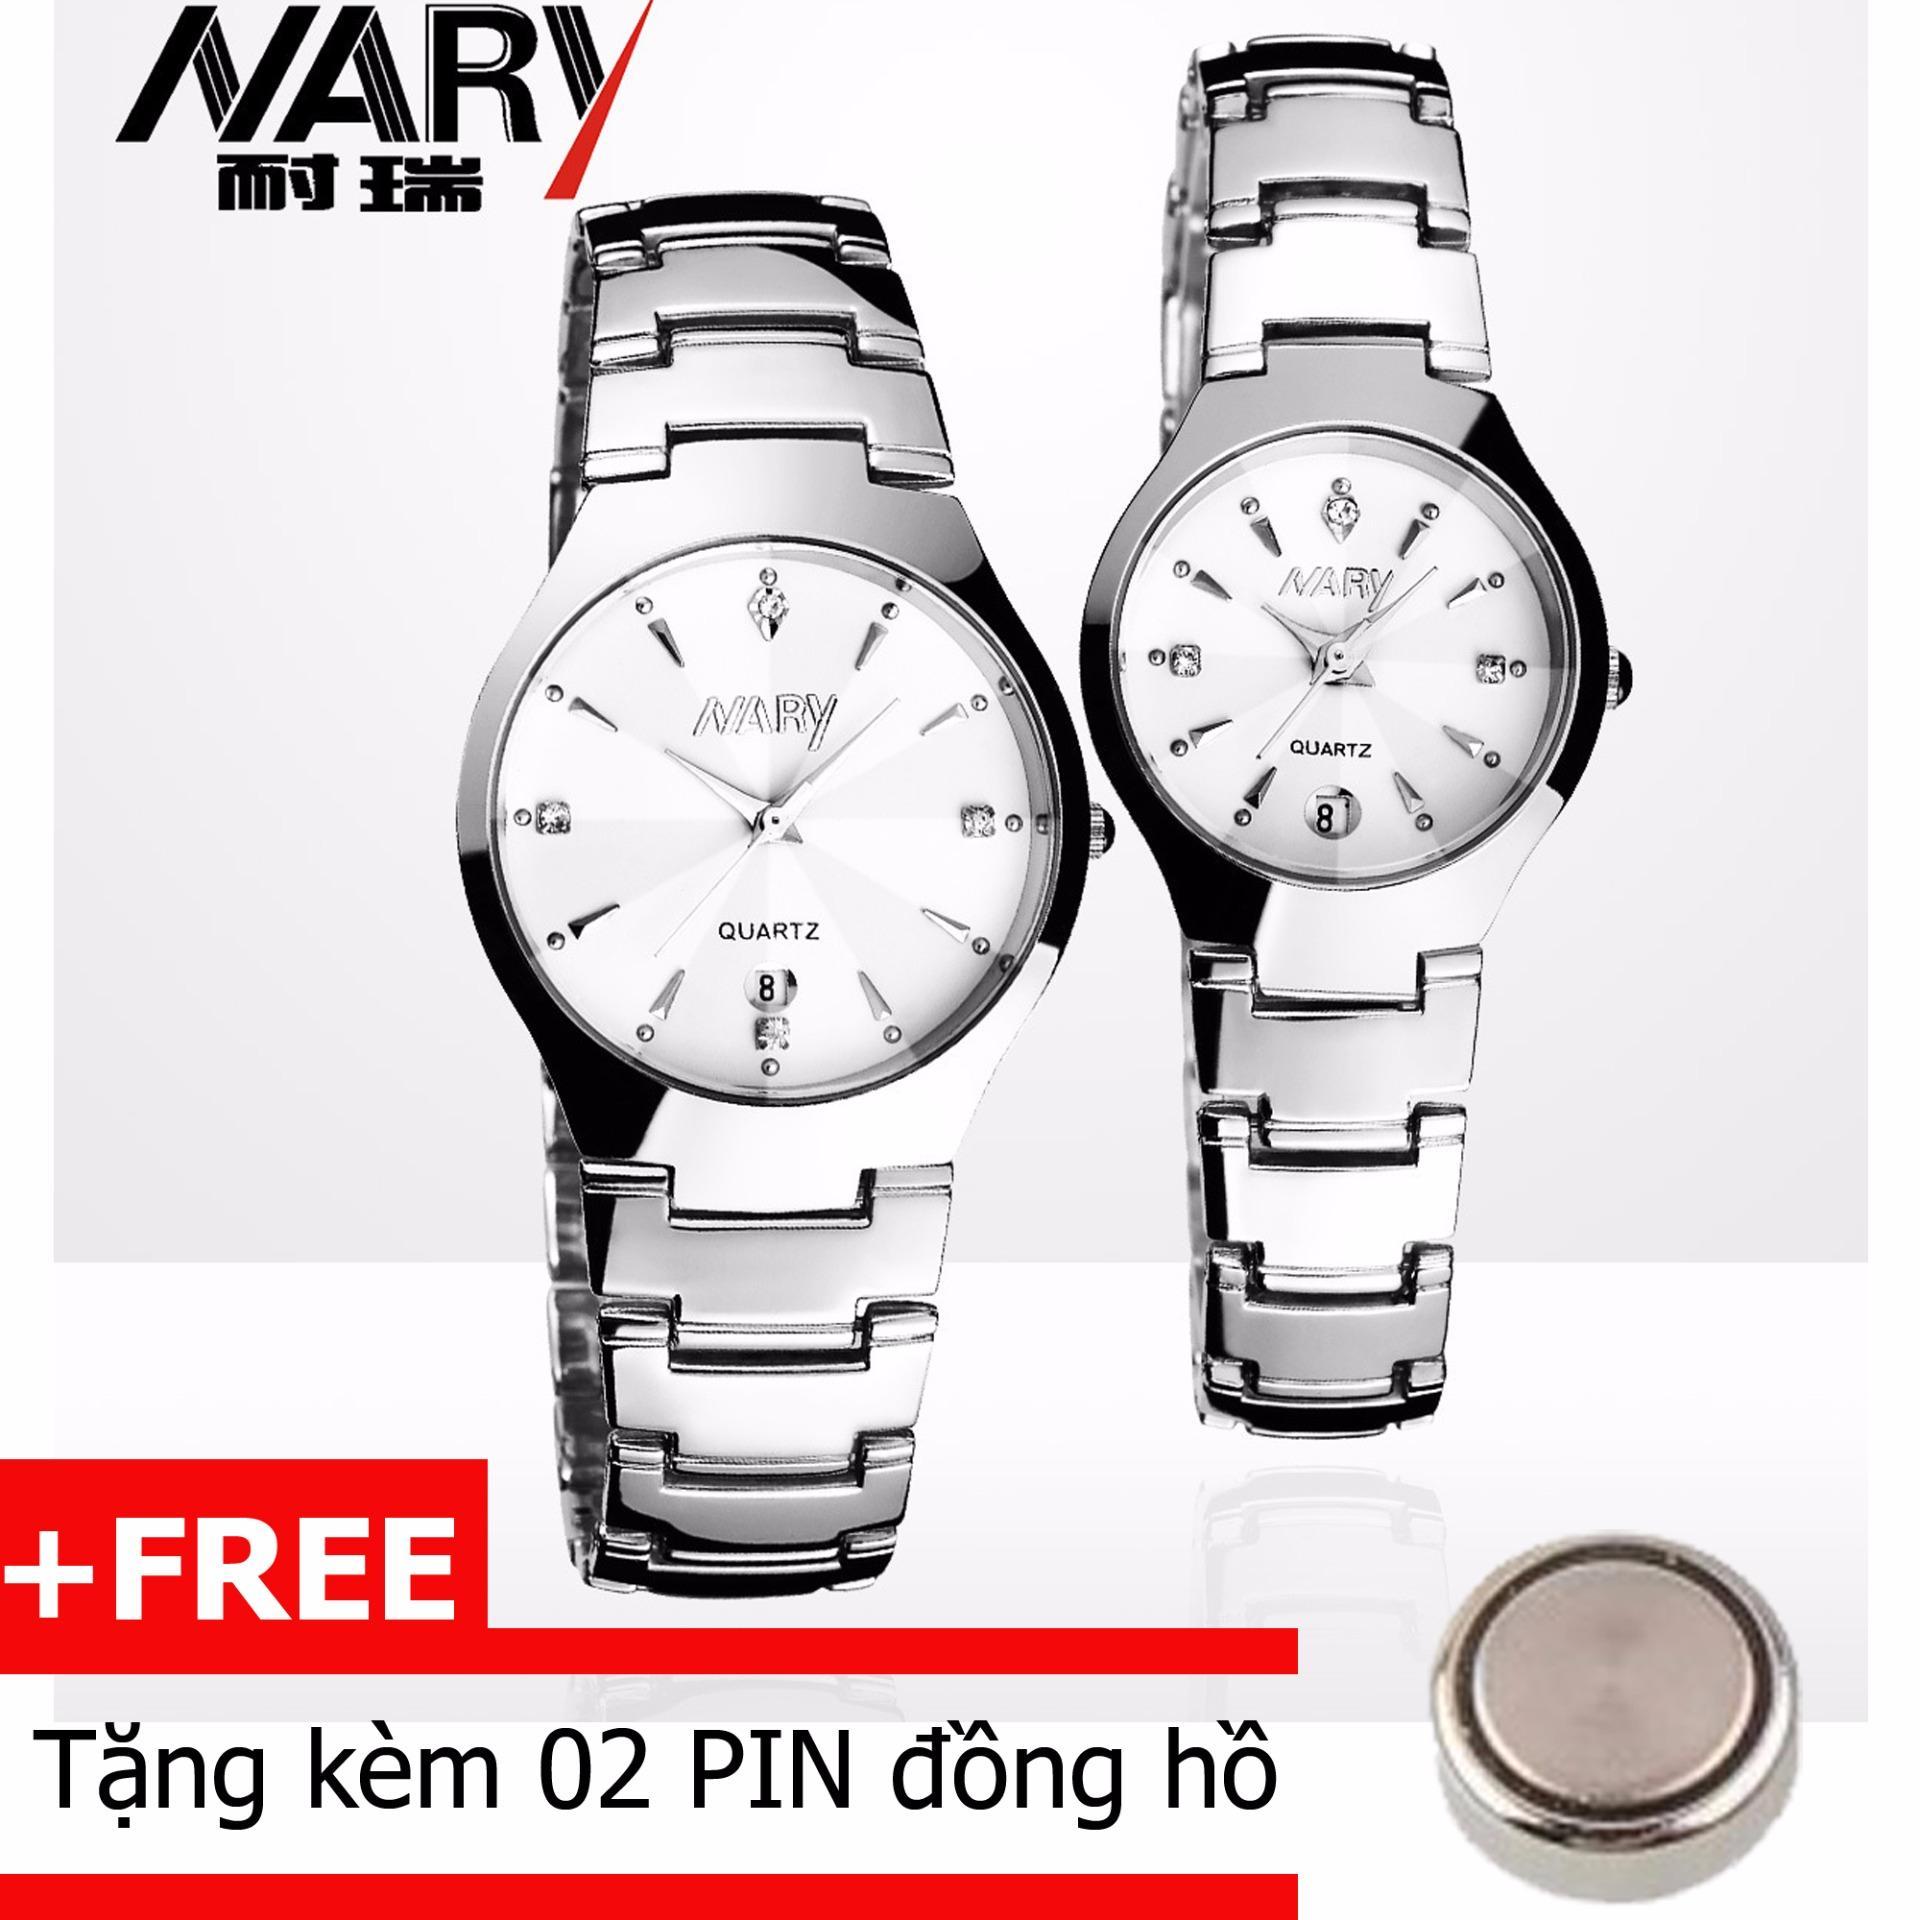 Đồng hồ cặp dây hợp kim Nary 1004